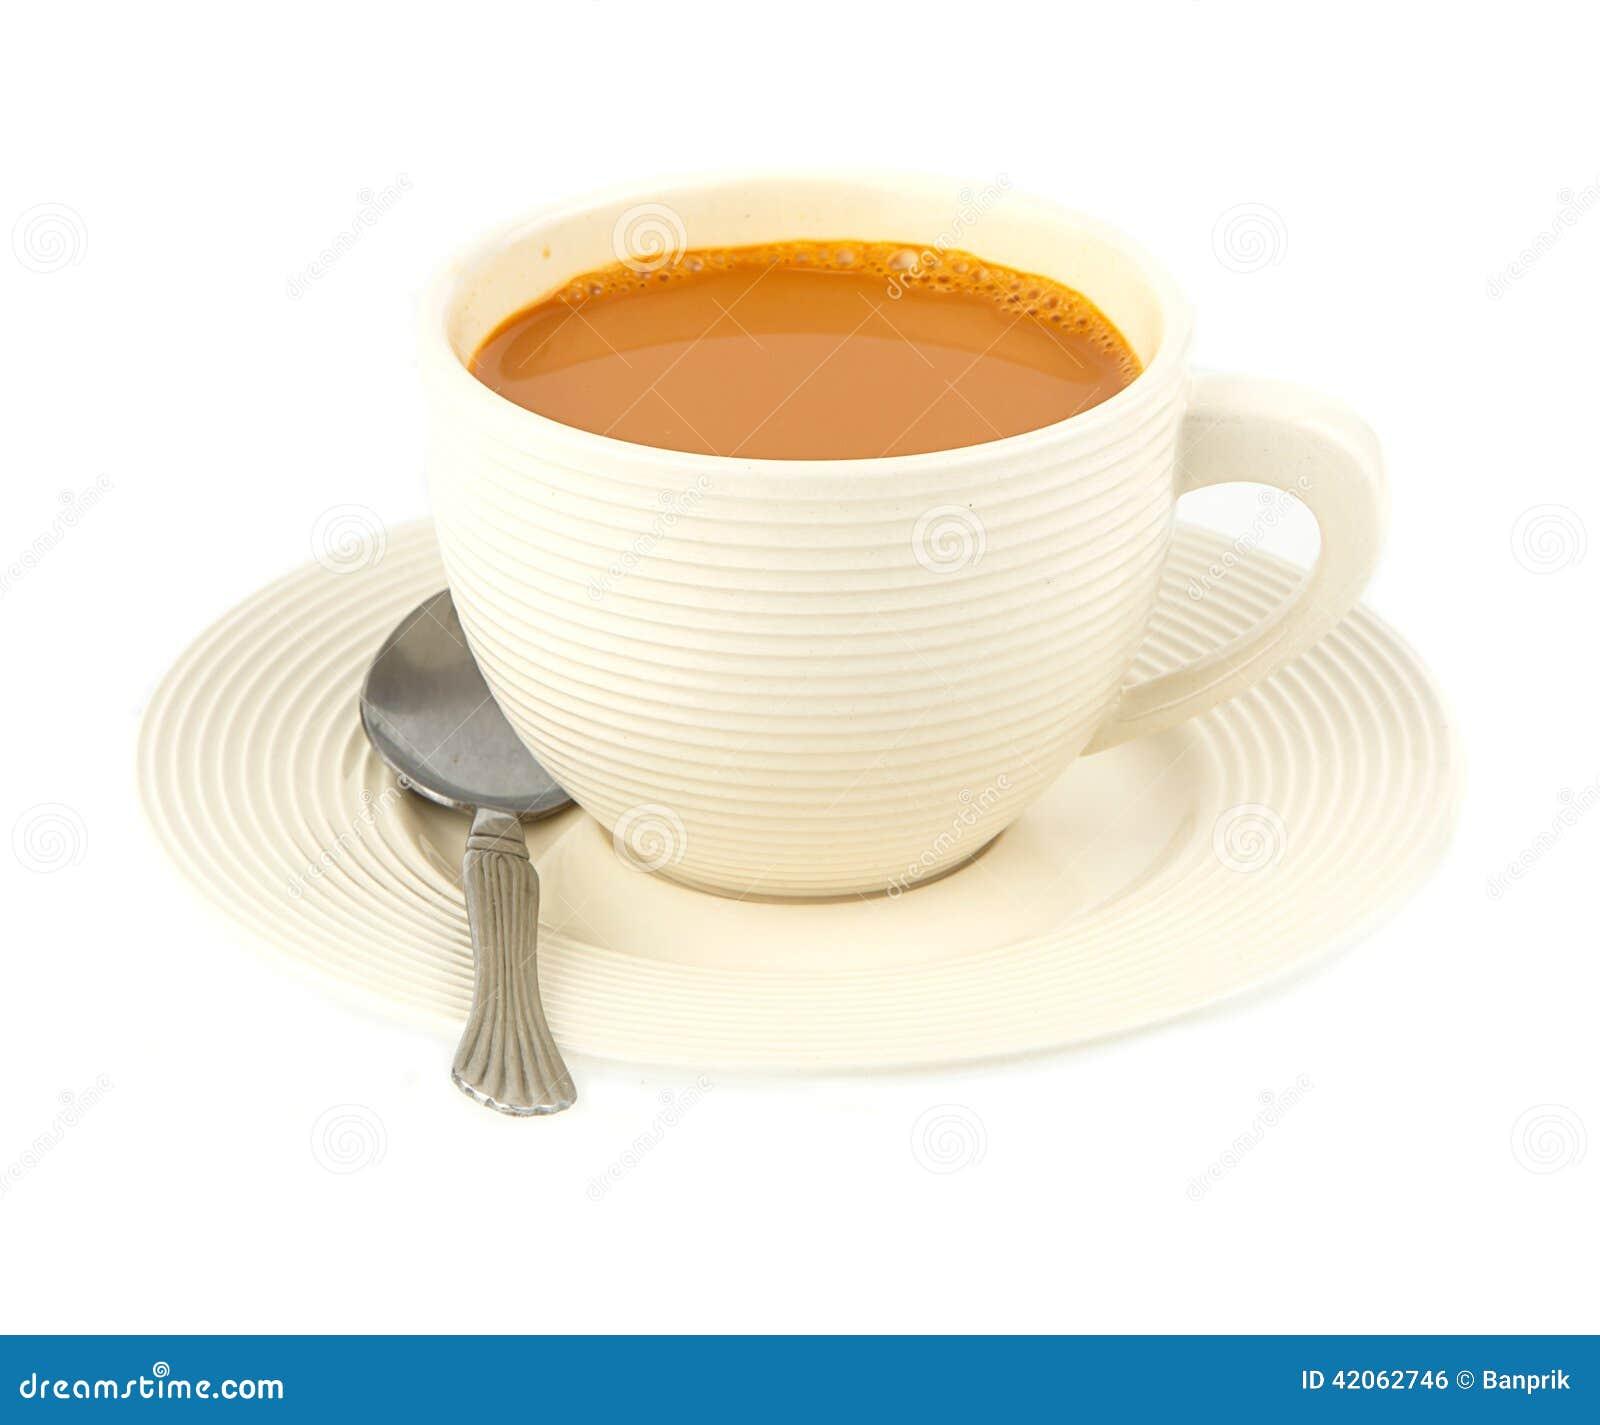 hot coffee white background - photo #48